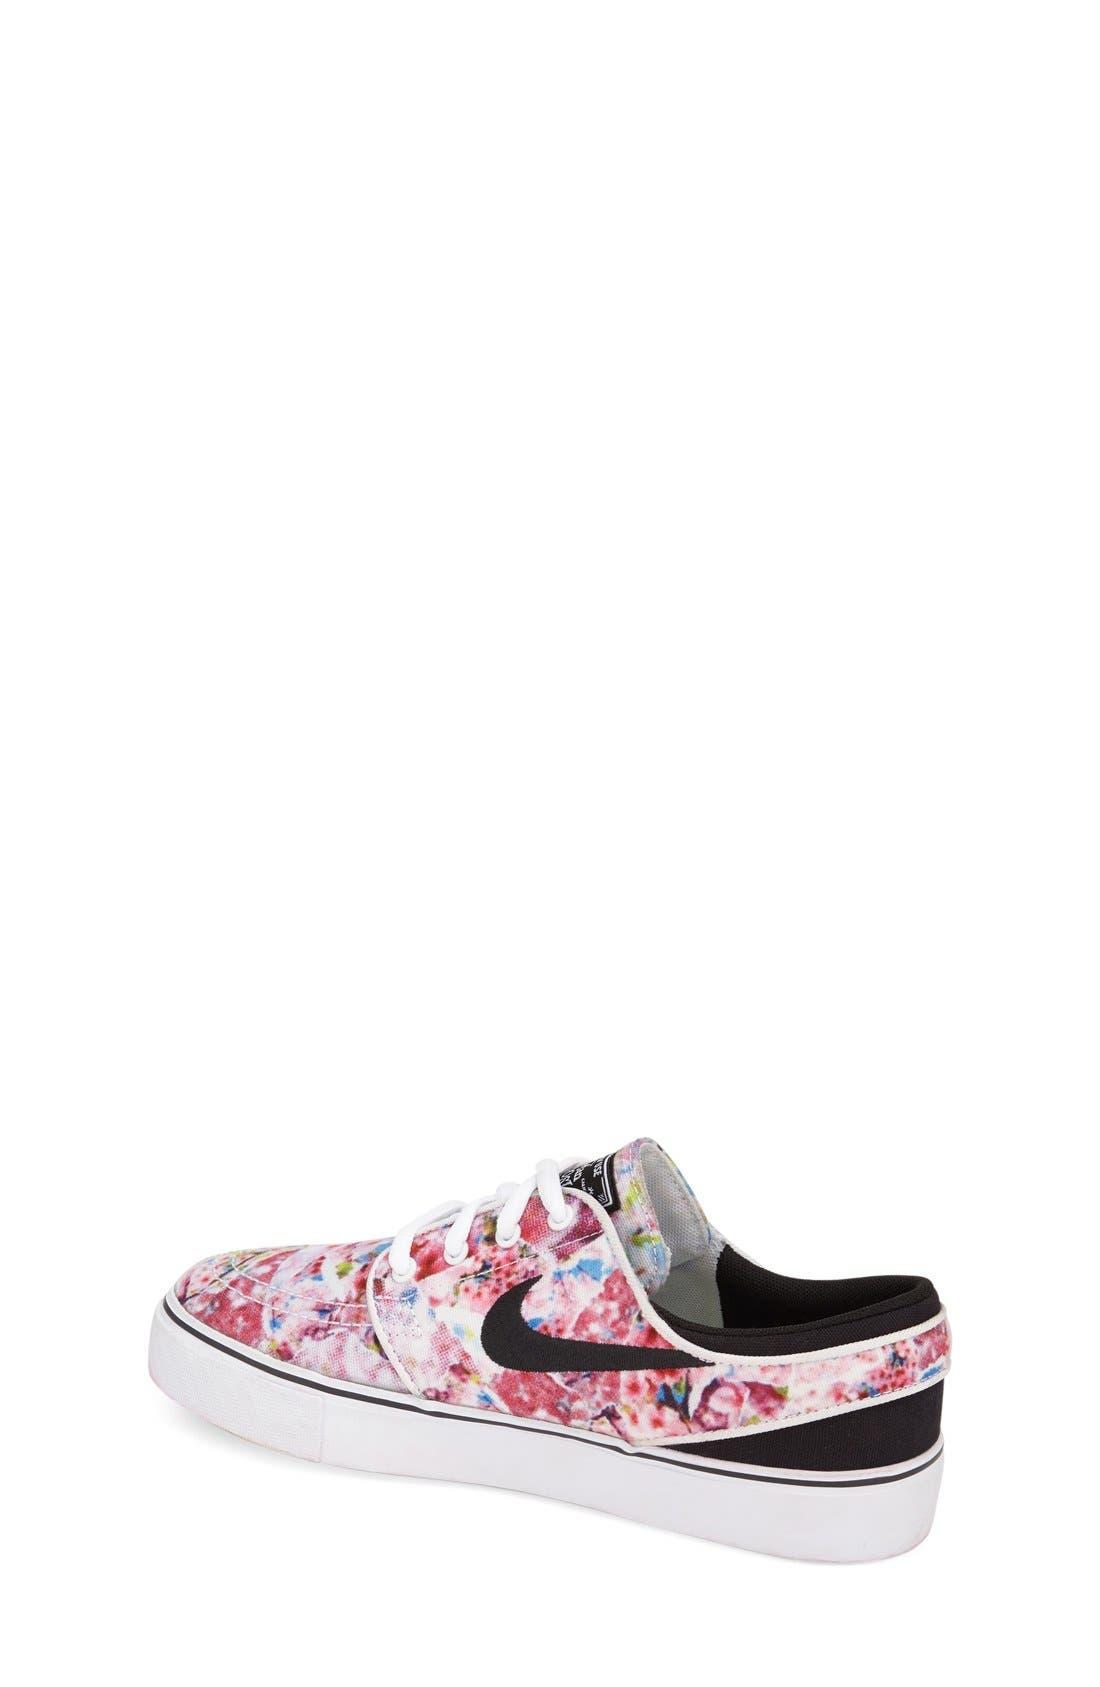 Alternate Image 4  - Nike 'Stefan Janoski' Premium Canvas Sneaker (Big Kid)